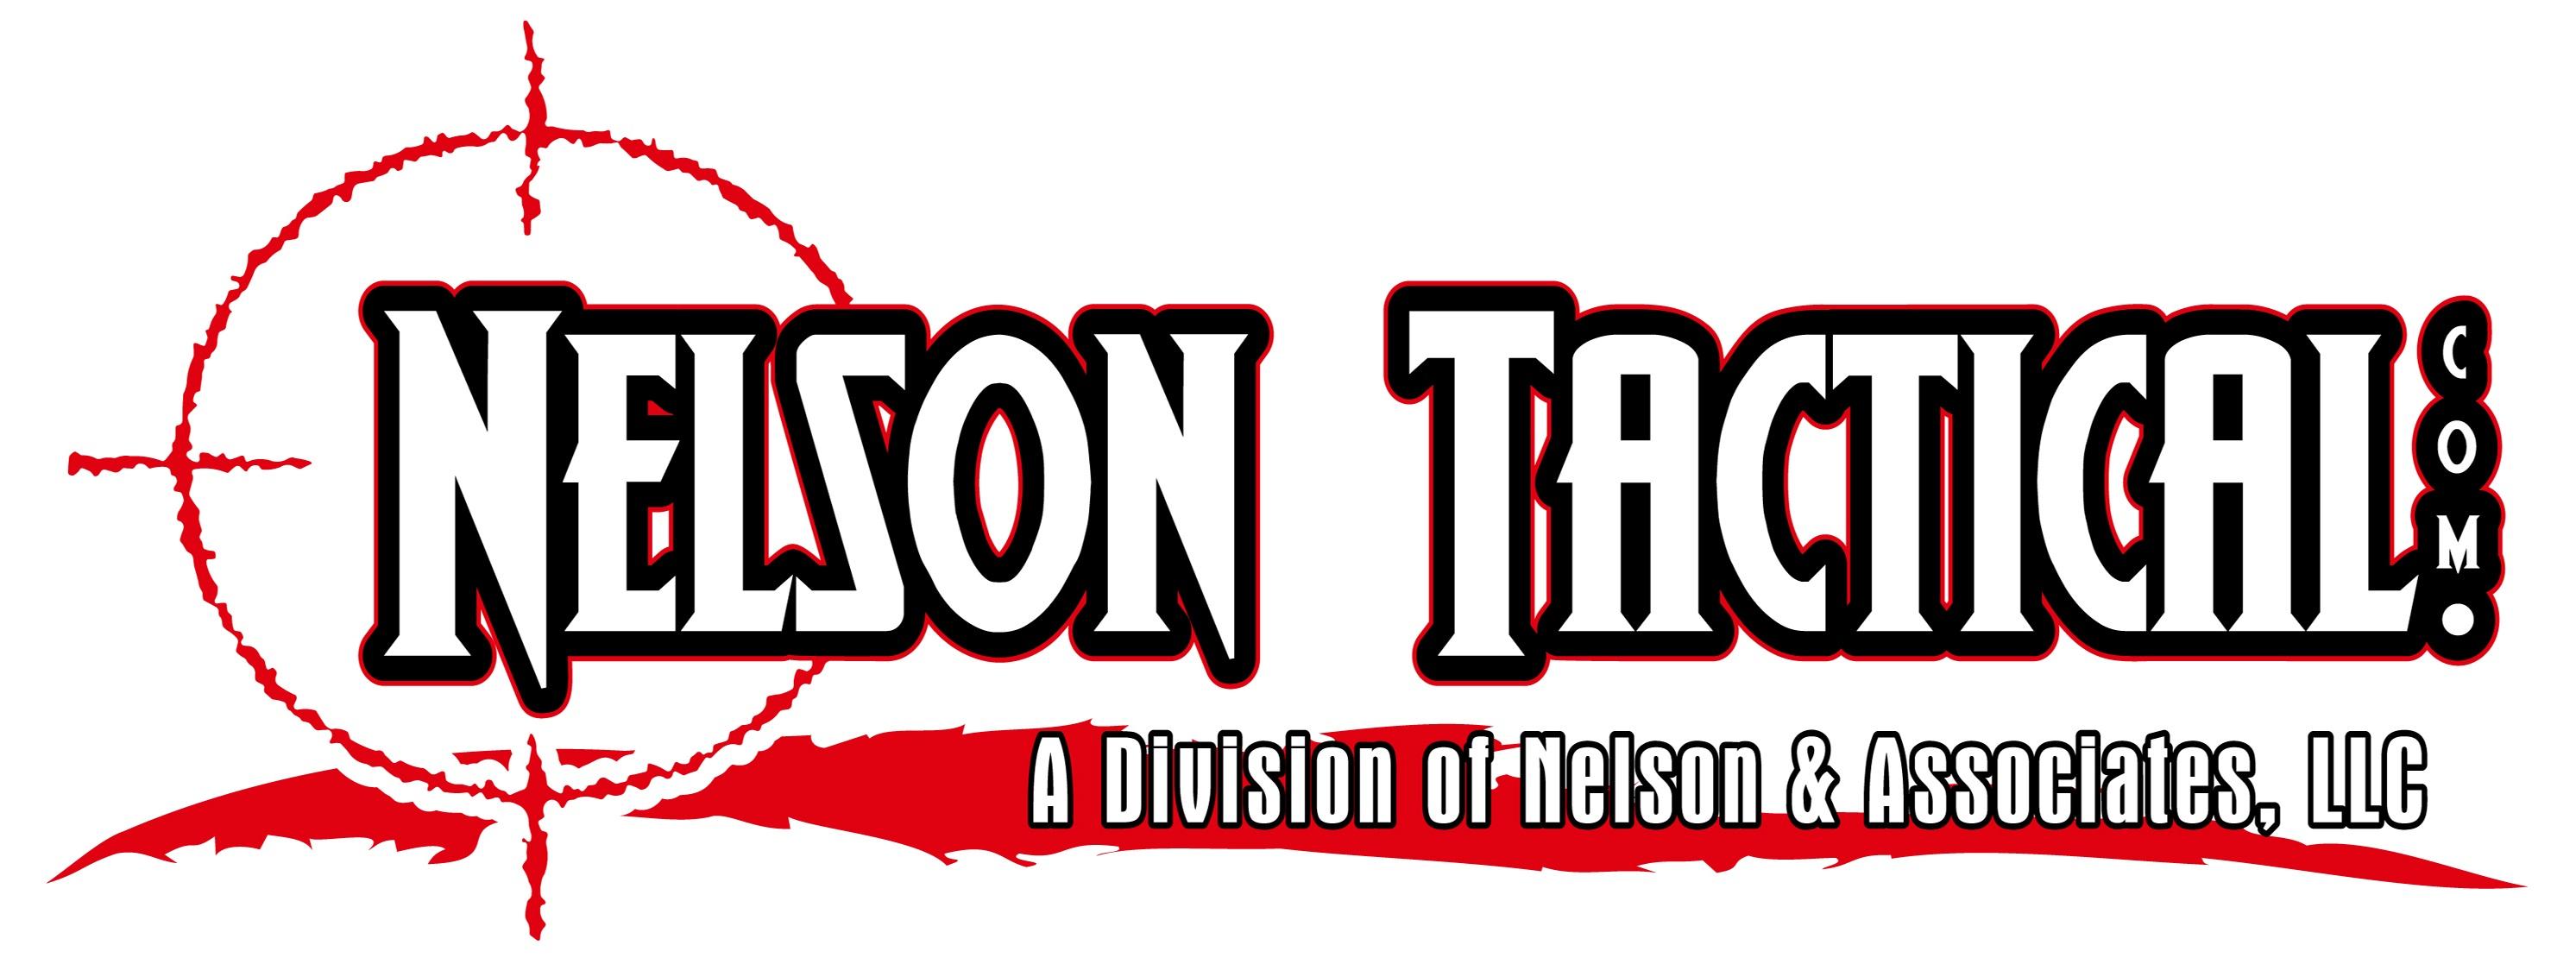 Bronze Sponsors - Nelson Tactical - Logo